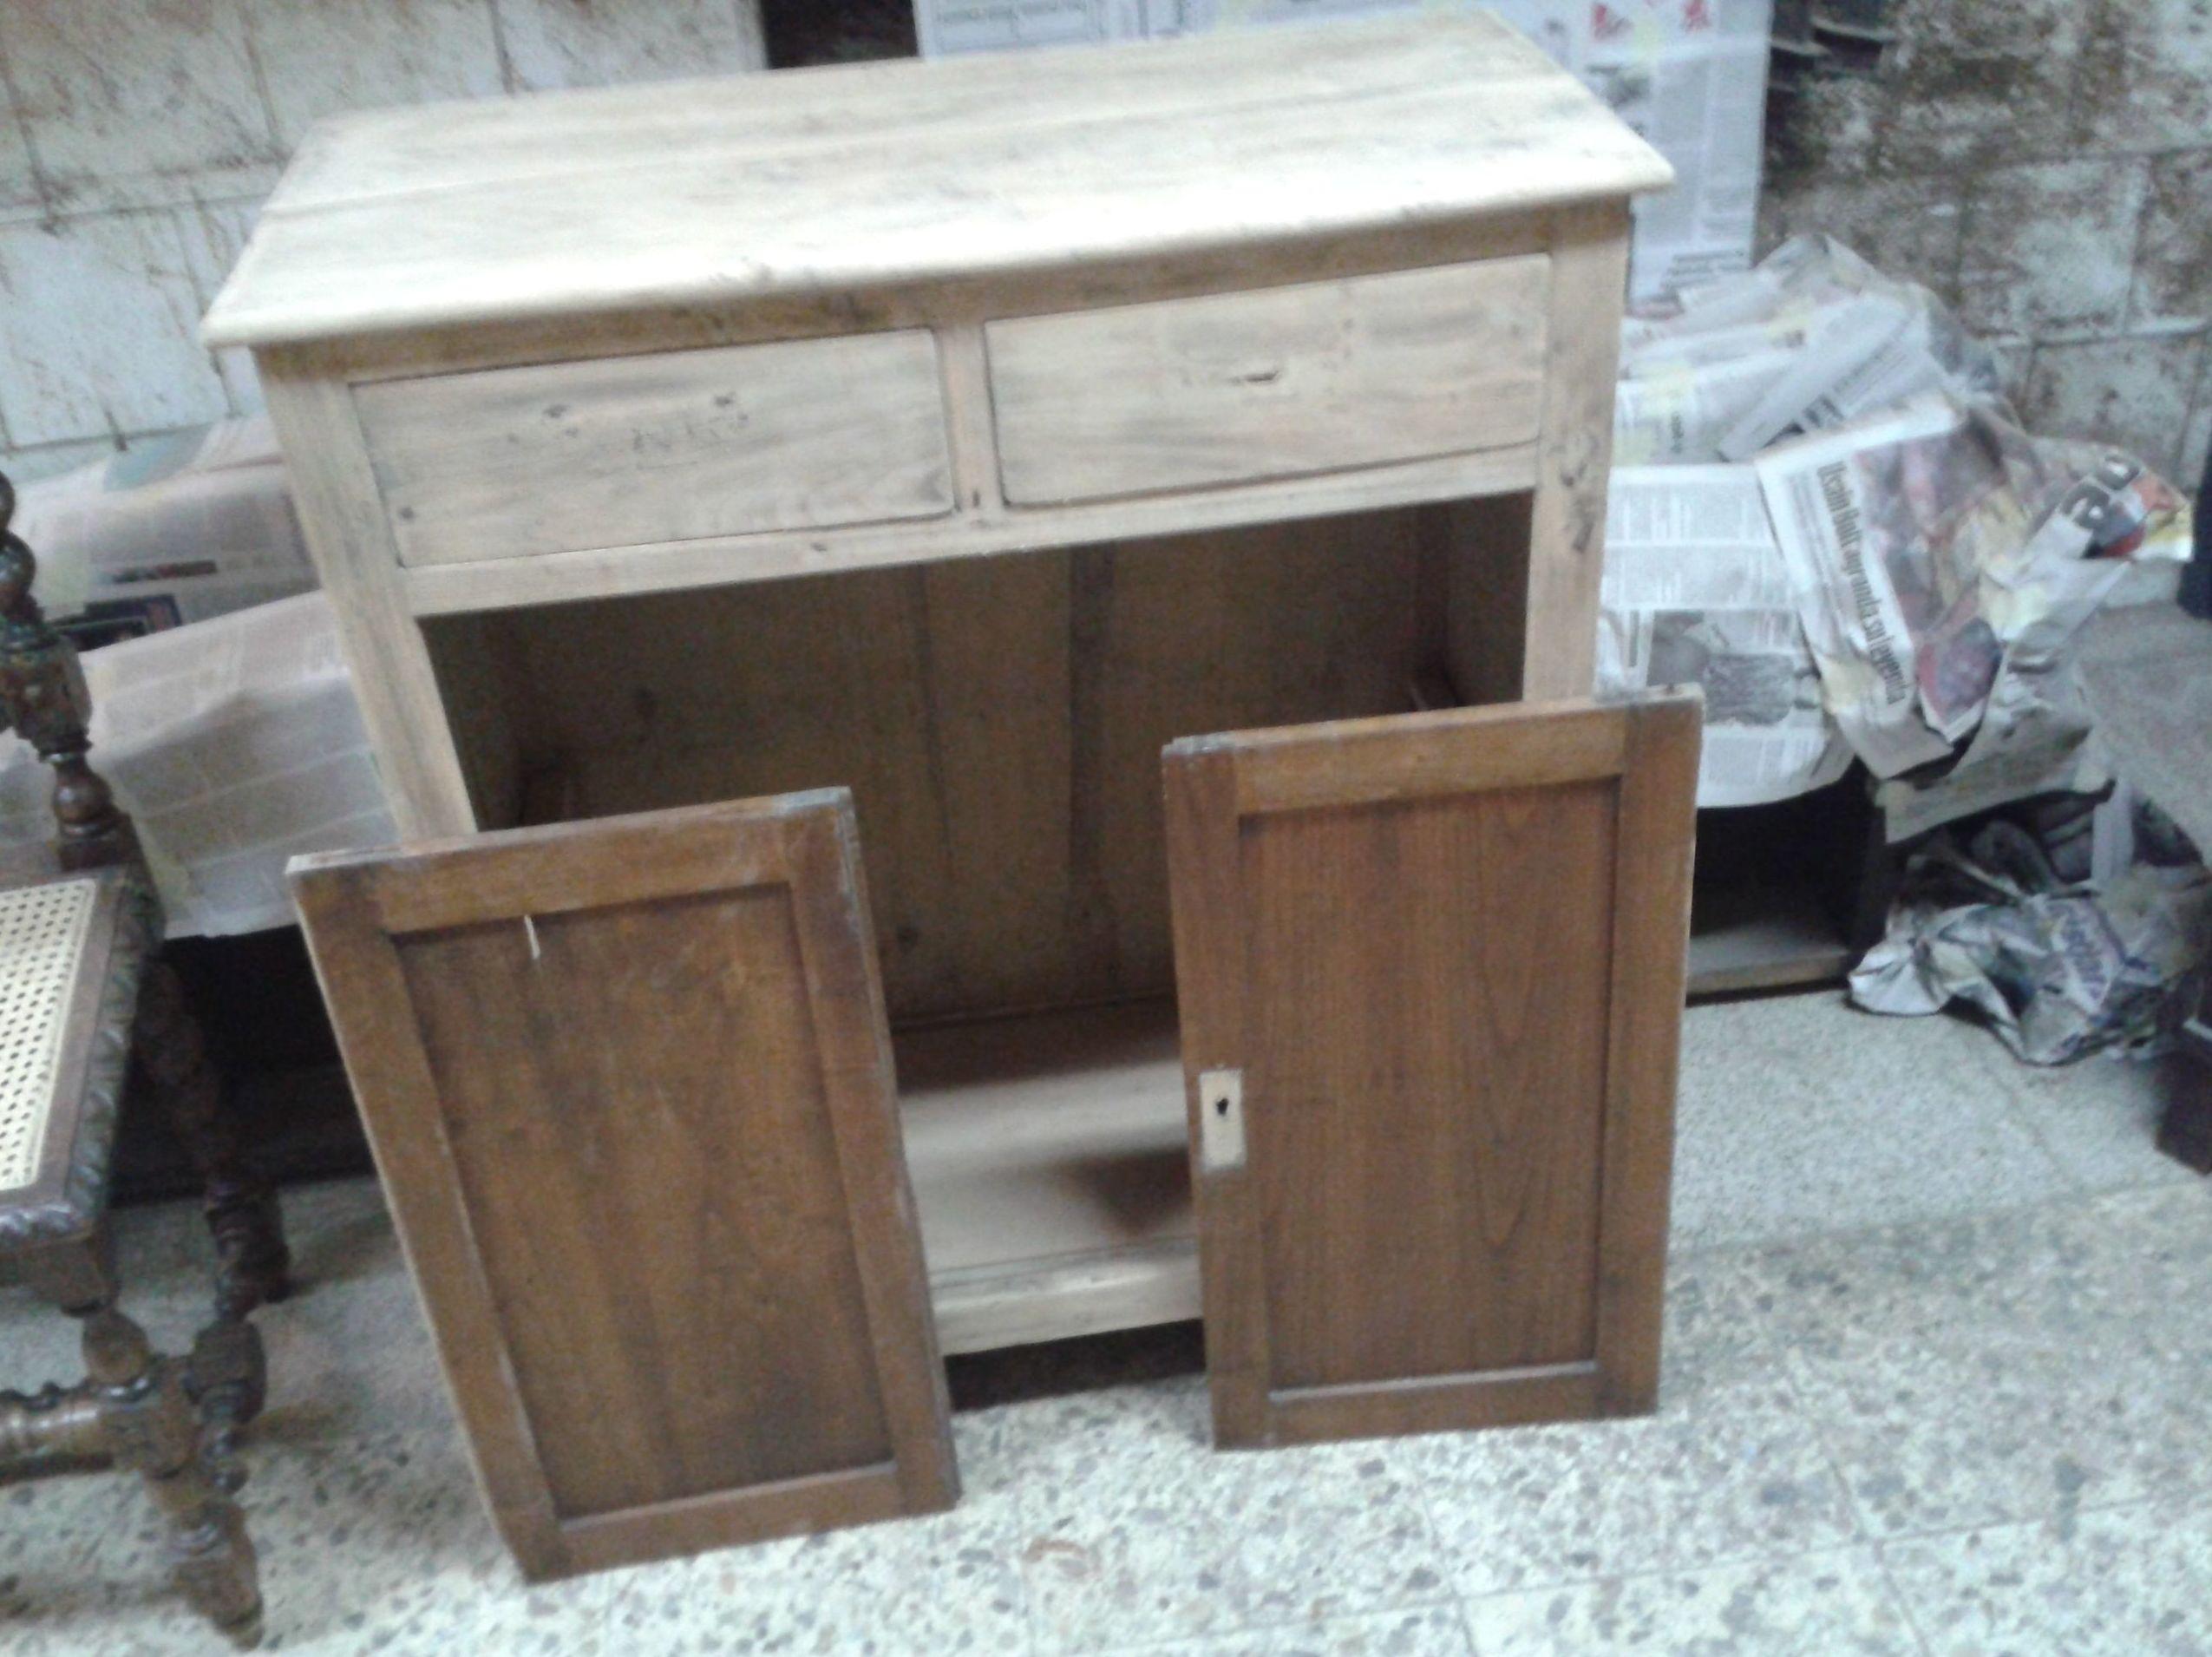 Foto 58 de Restauración de muebles en Pamplona | Lendik Restauración